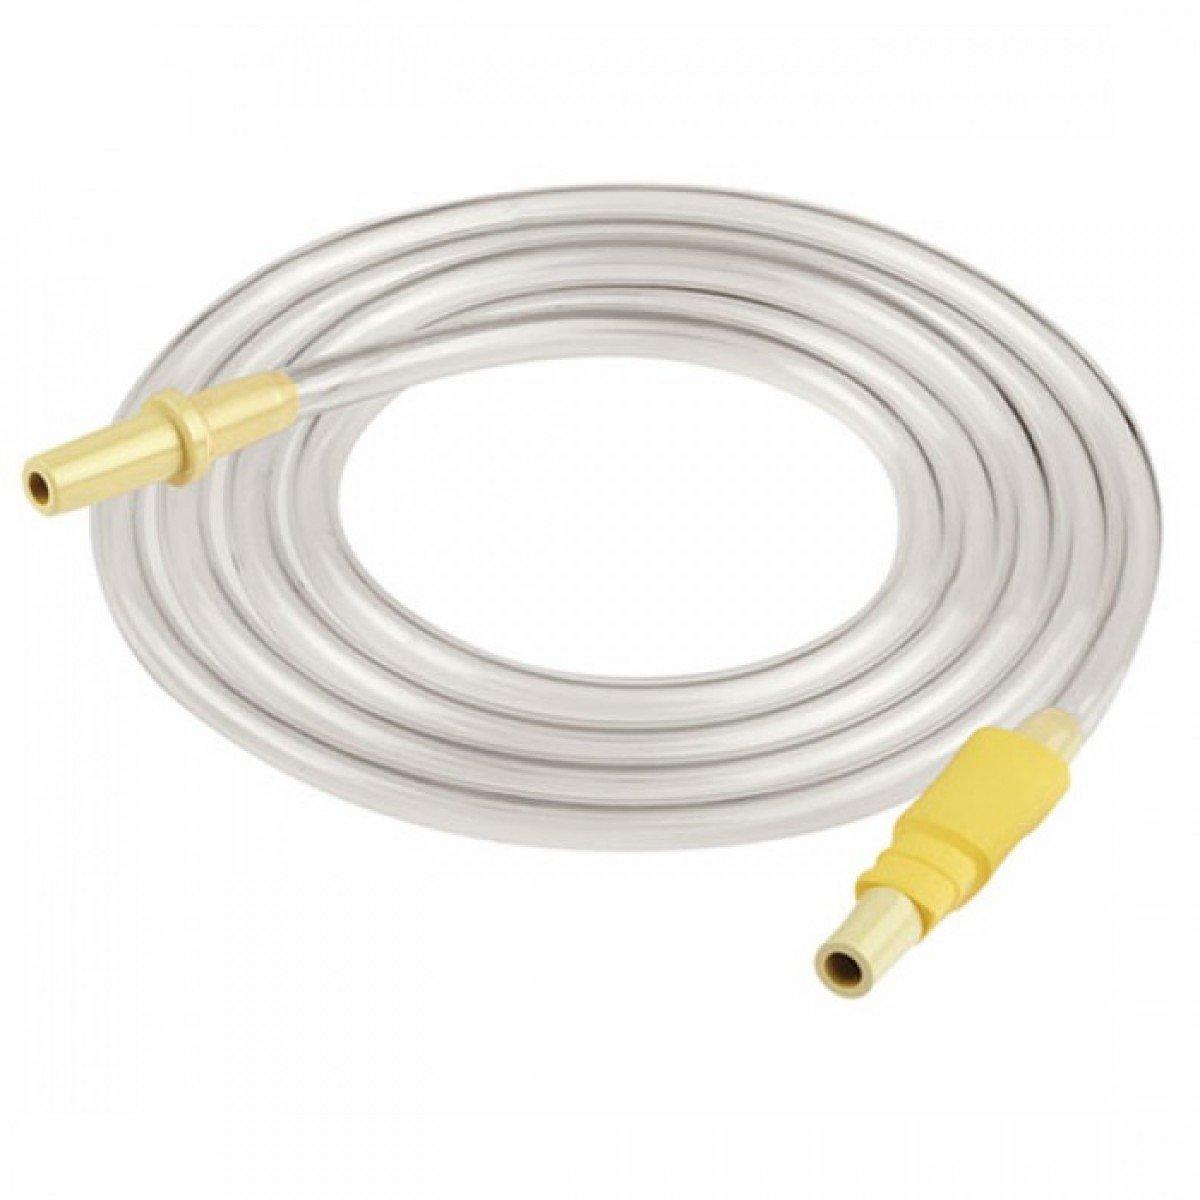 Tubing for Medela Pump In Style Tubing Medela Tubing Medela Replacement Tubing